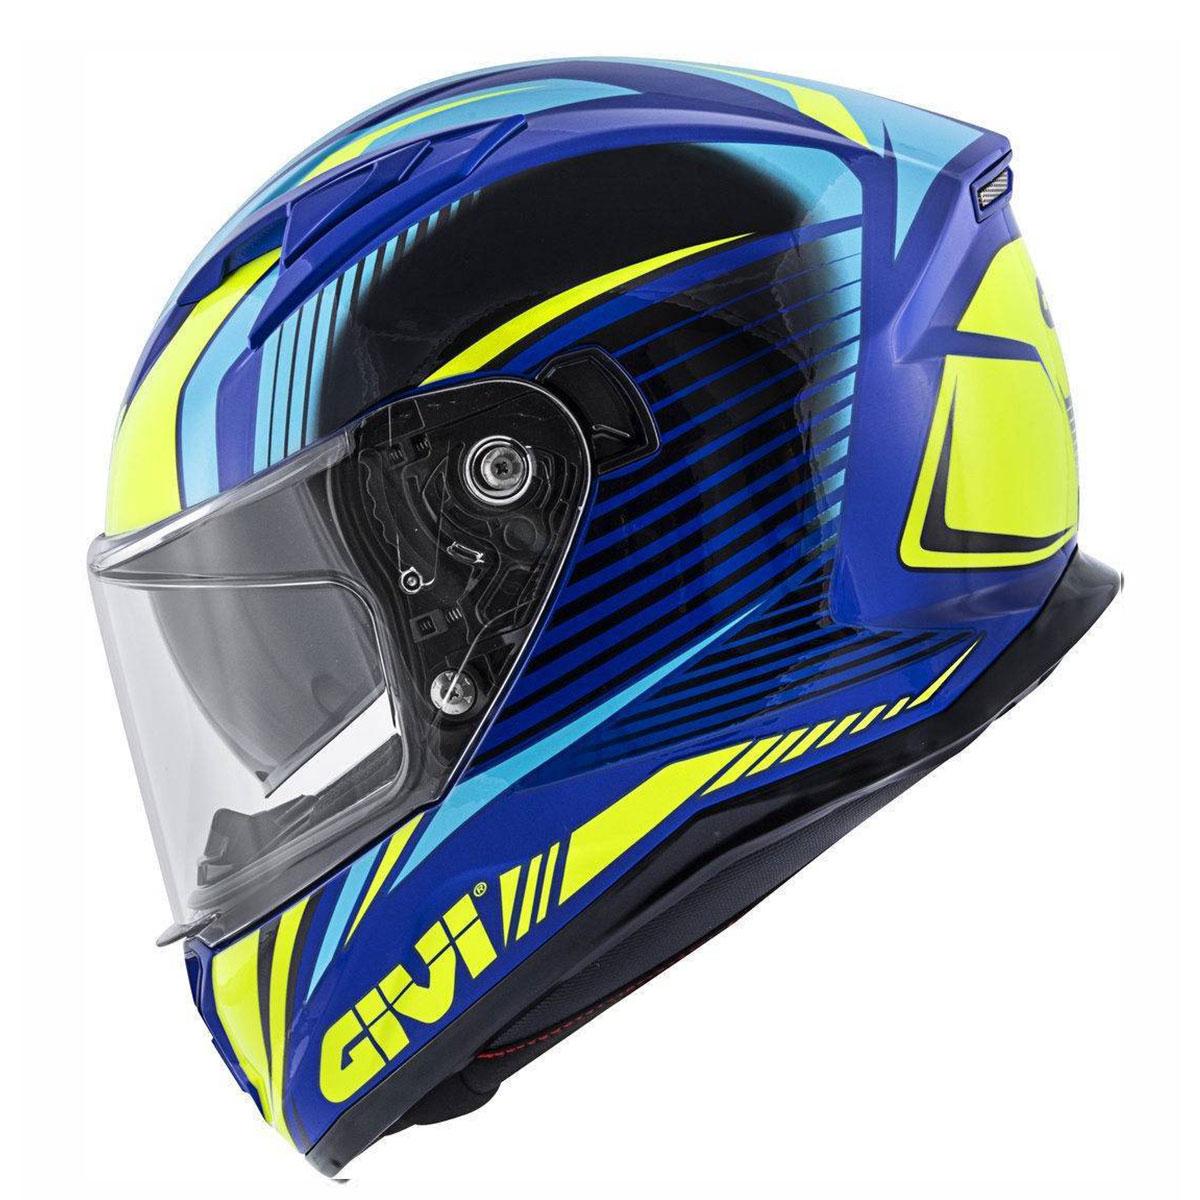 Givi Stoccarda Glade Full Face Motosiklet Kaskı